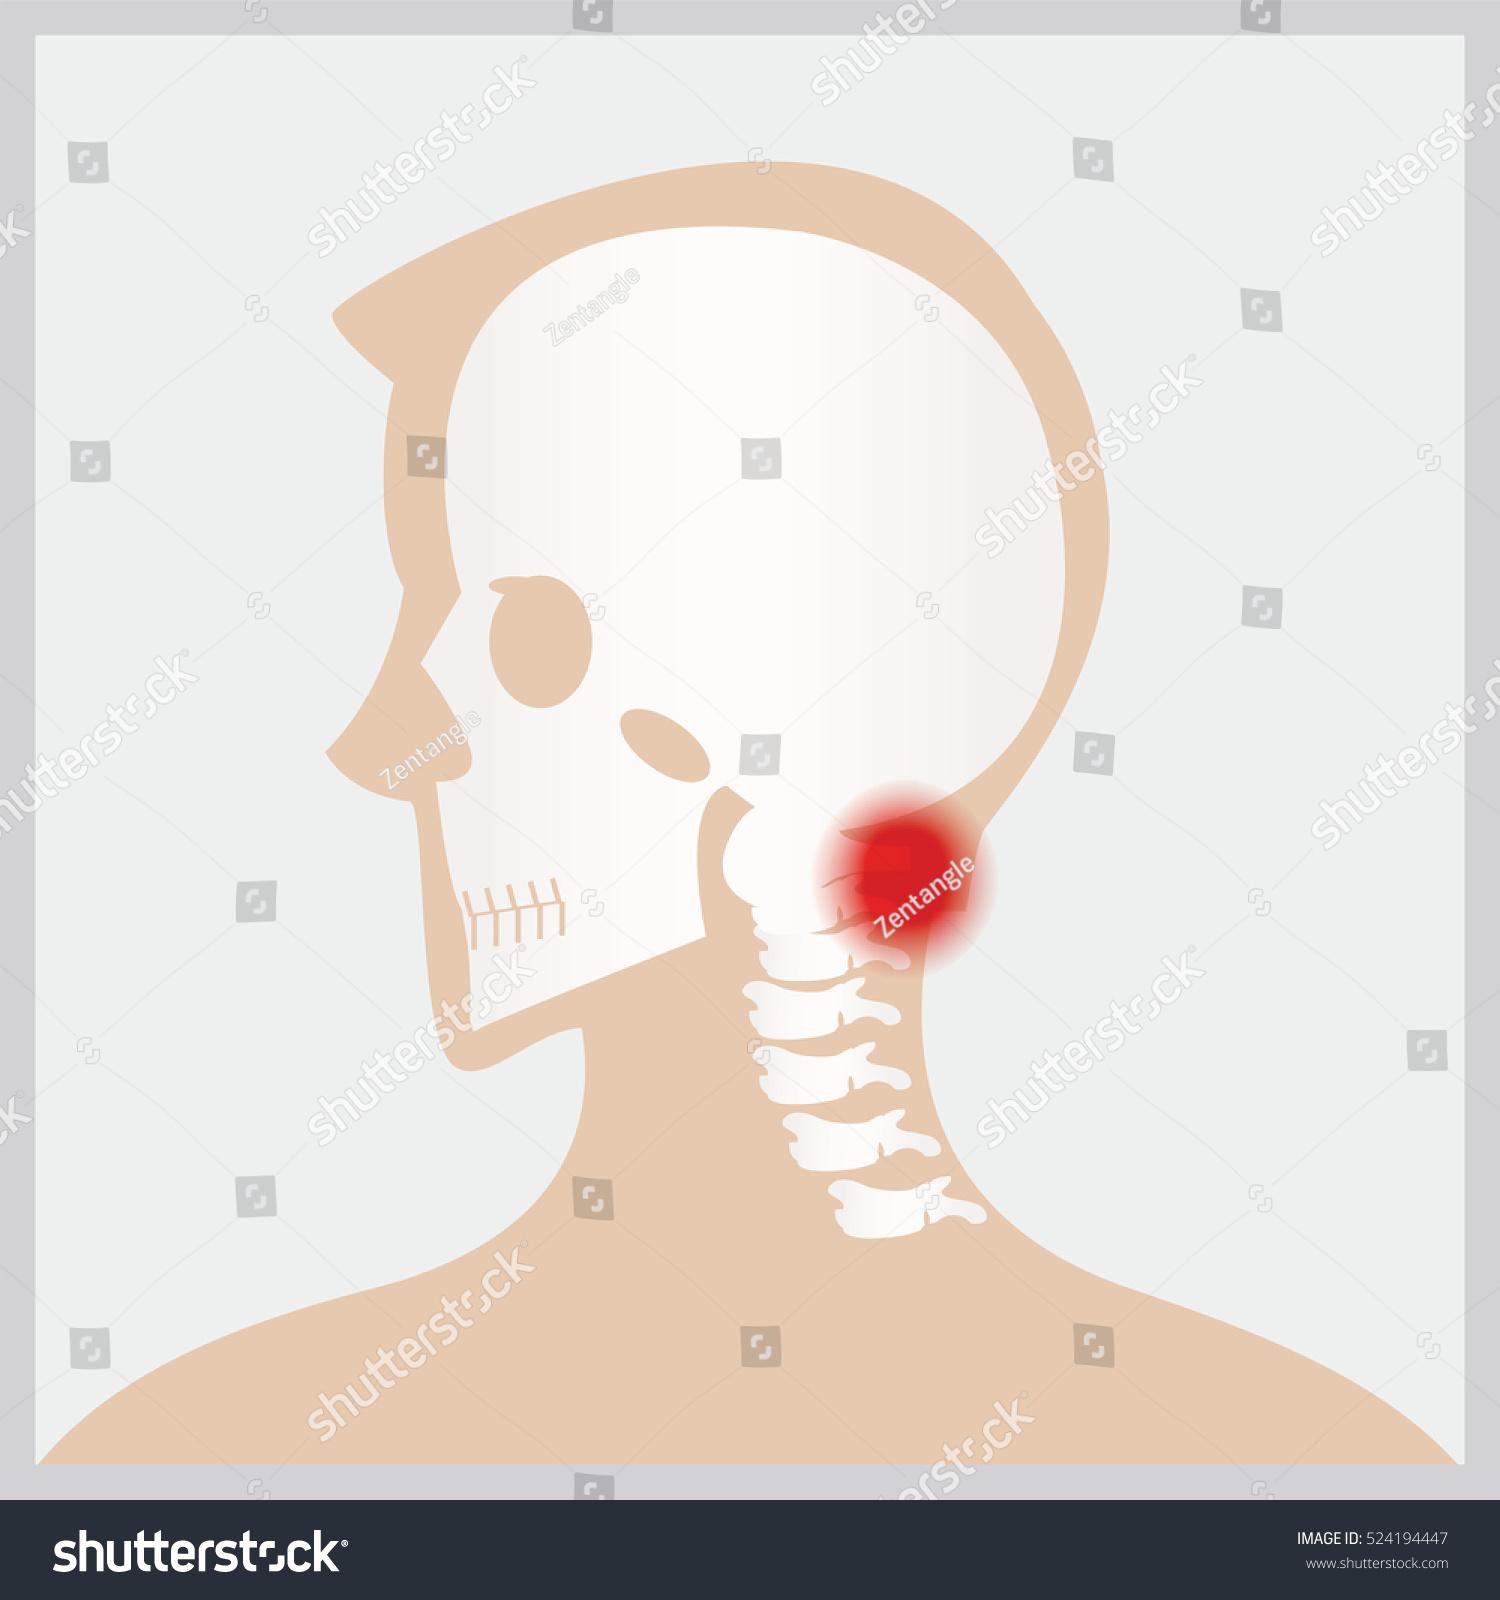 Disease Head Neck Joints Boneshuman Joints Stock Vector (Royalty ...